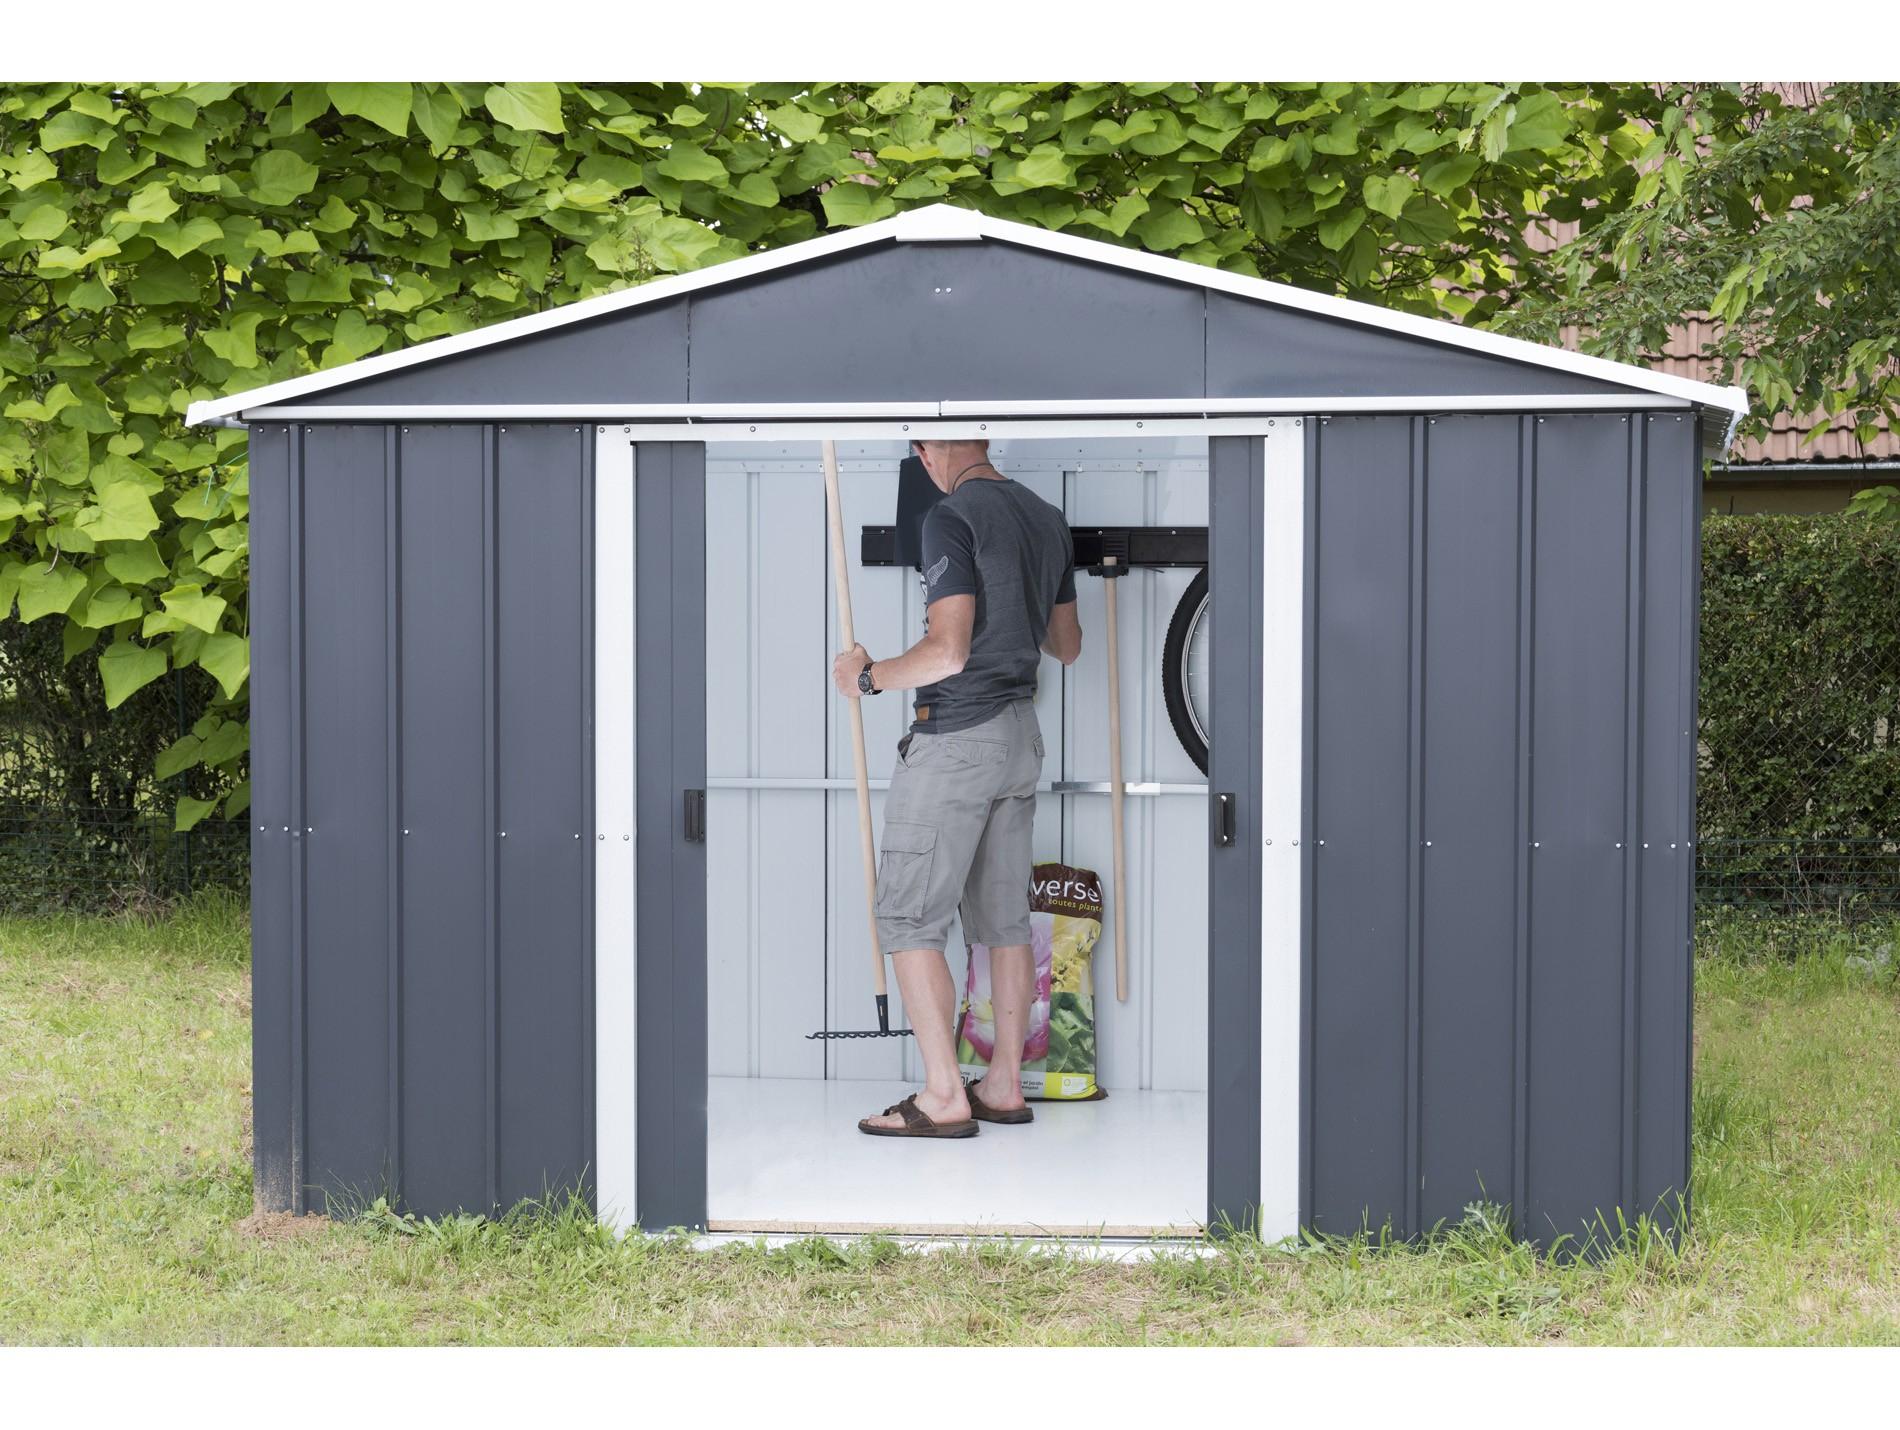 Abri De Jardin Métal Yardmaster Gris Anthracite 7,18 M² concernant Cabane De Jardin En Tole